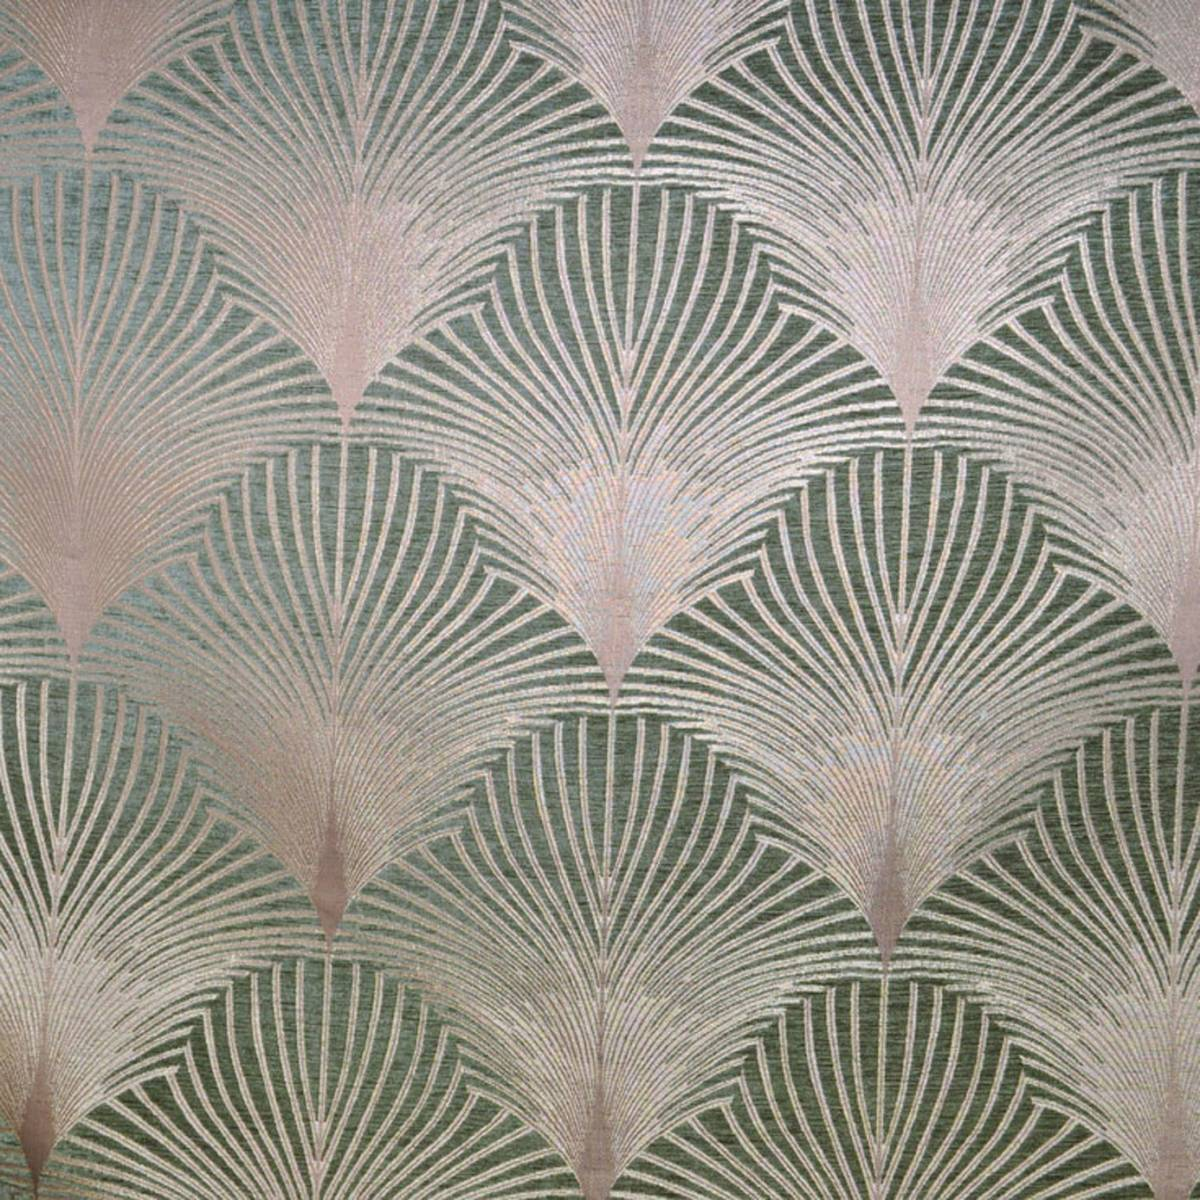 New York Fabric Liberty Ny 08 Fibre Naturelle New